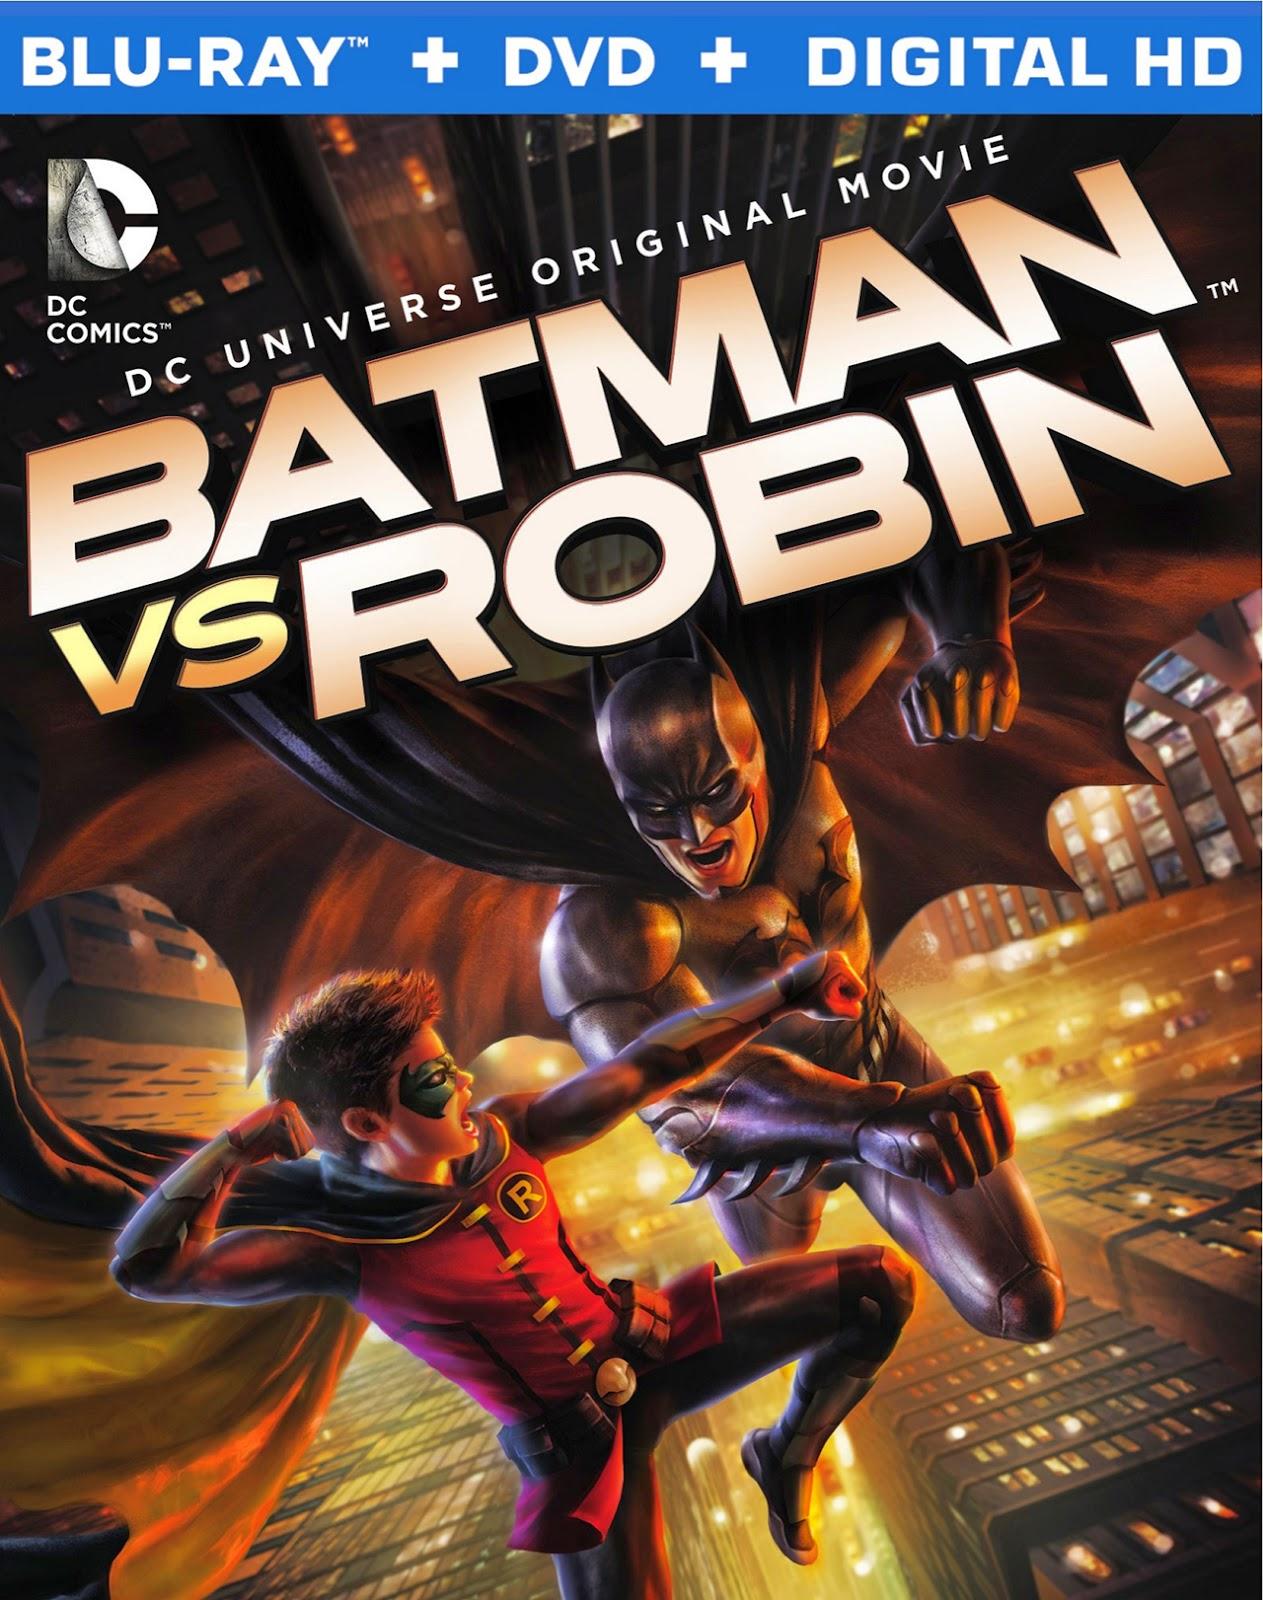 Batman vs. Robin แบทแมน ปะทะ โรบิน [HD]